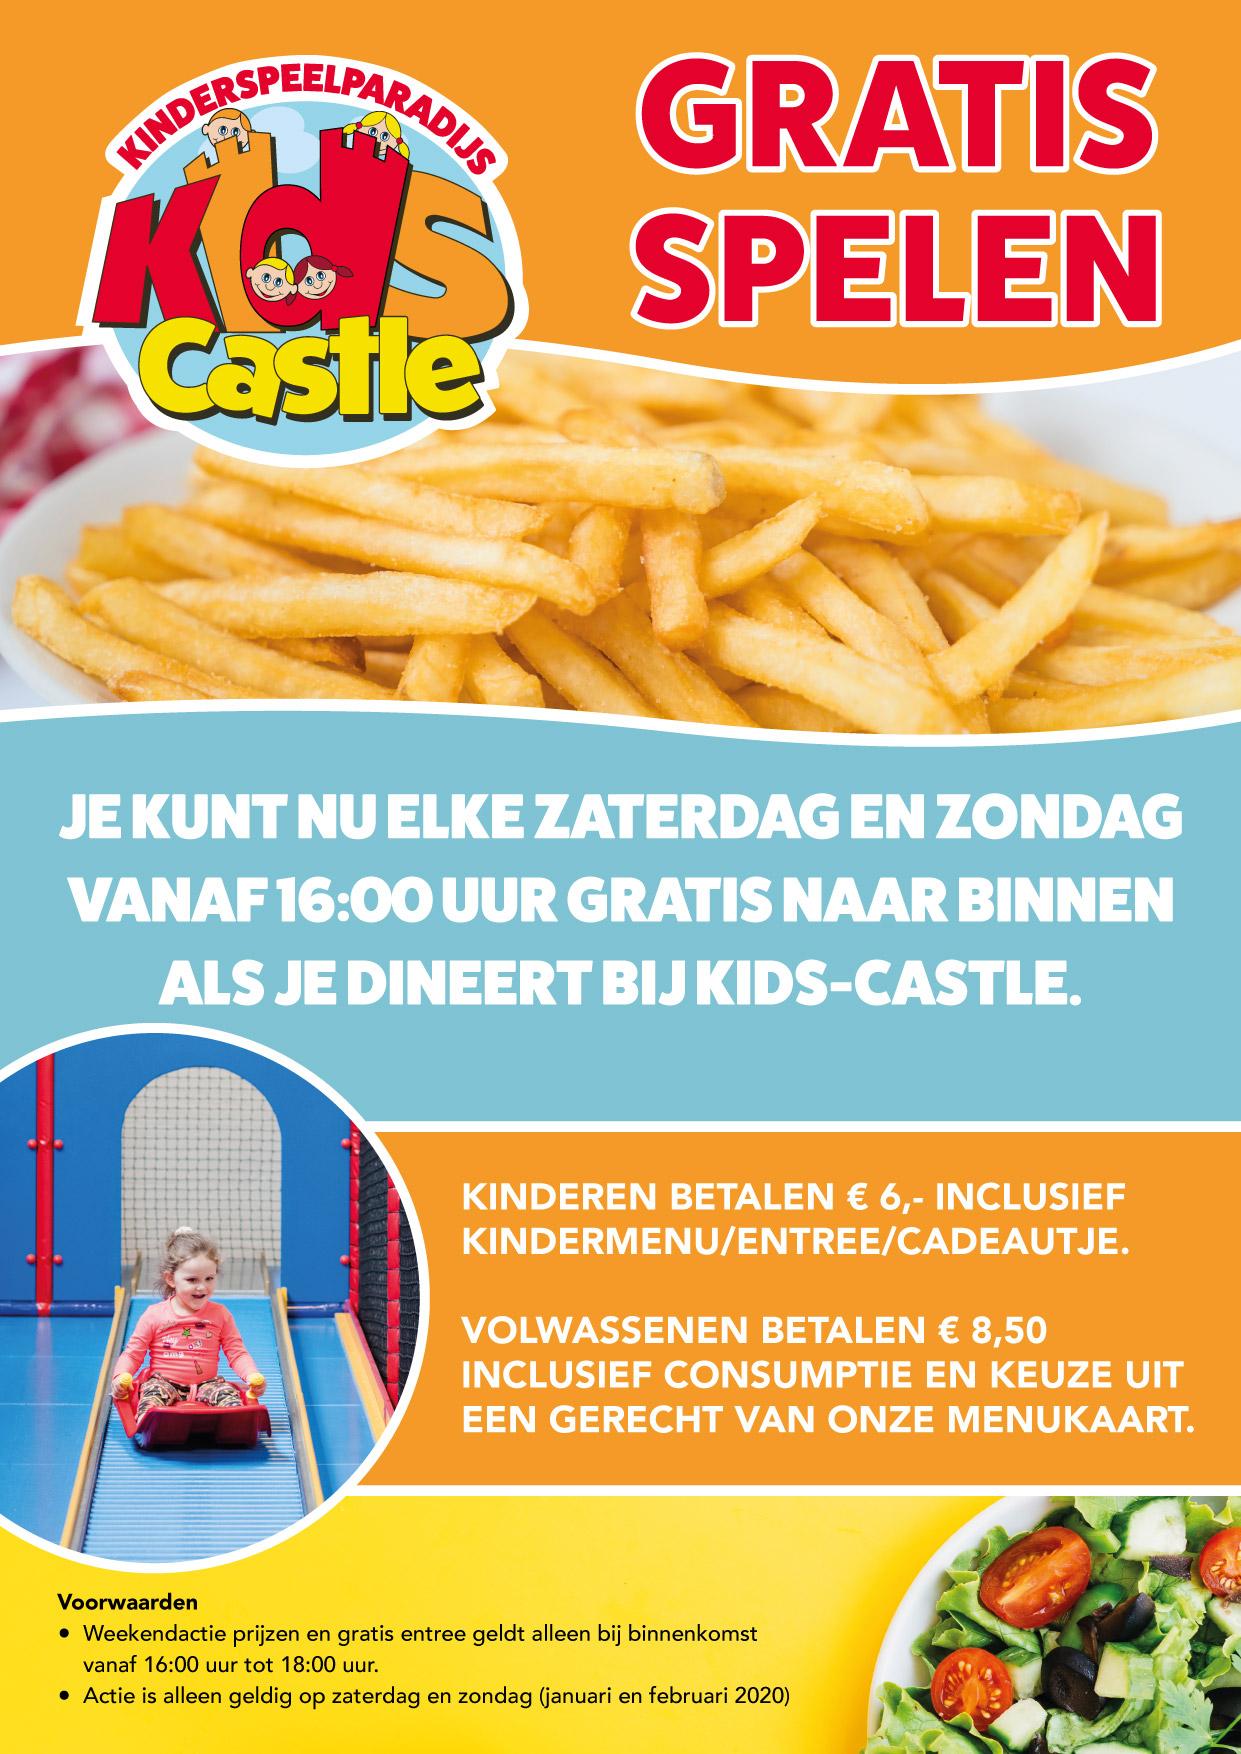 Kids-Castle_Flyer_A4_3mm-afloop_gratis-spelen_DEF